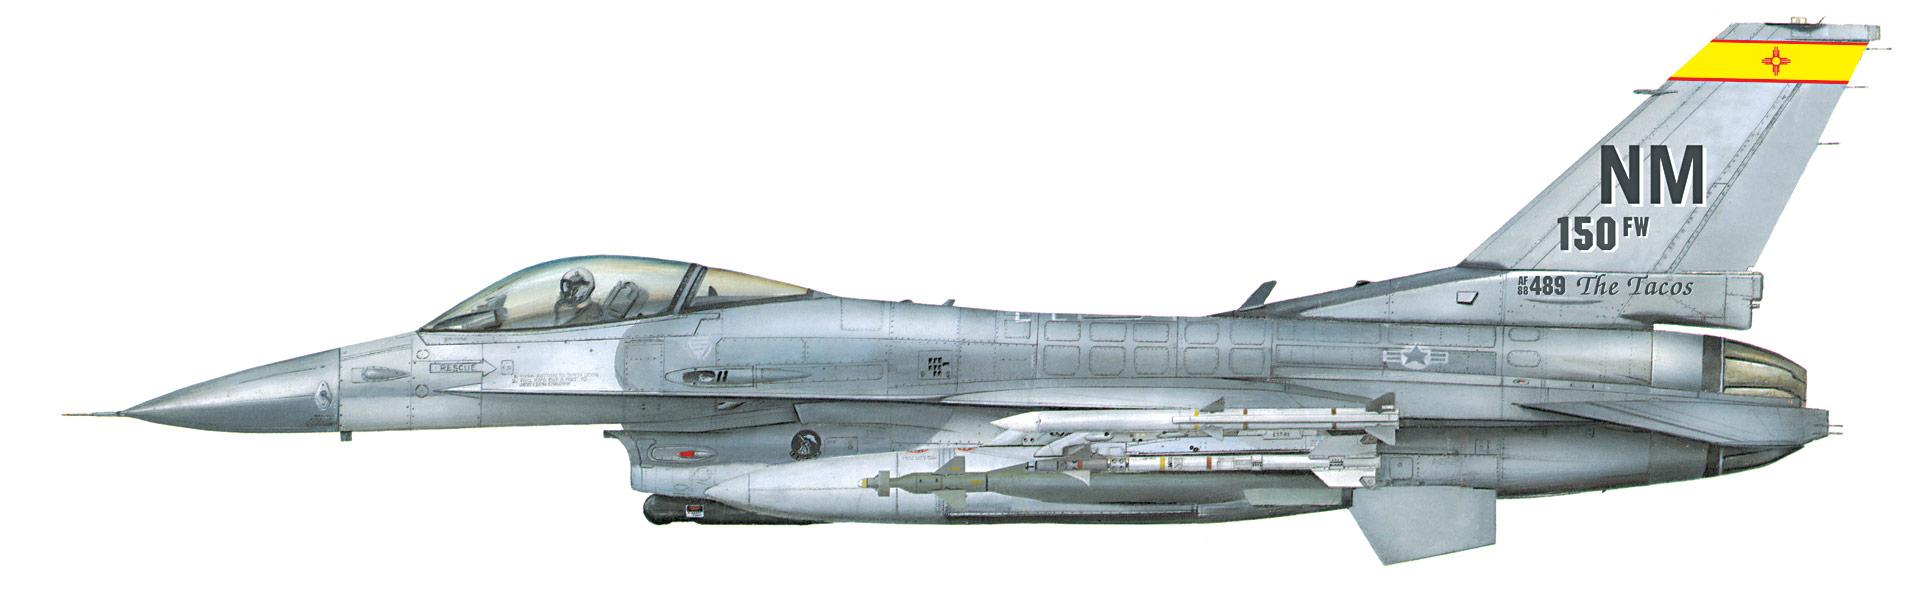 american_windsurfer-4.3-need_for_speed_F-16-plane